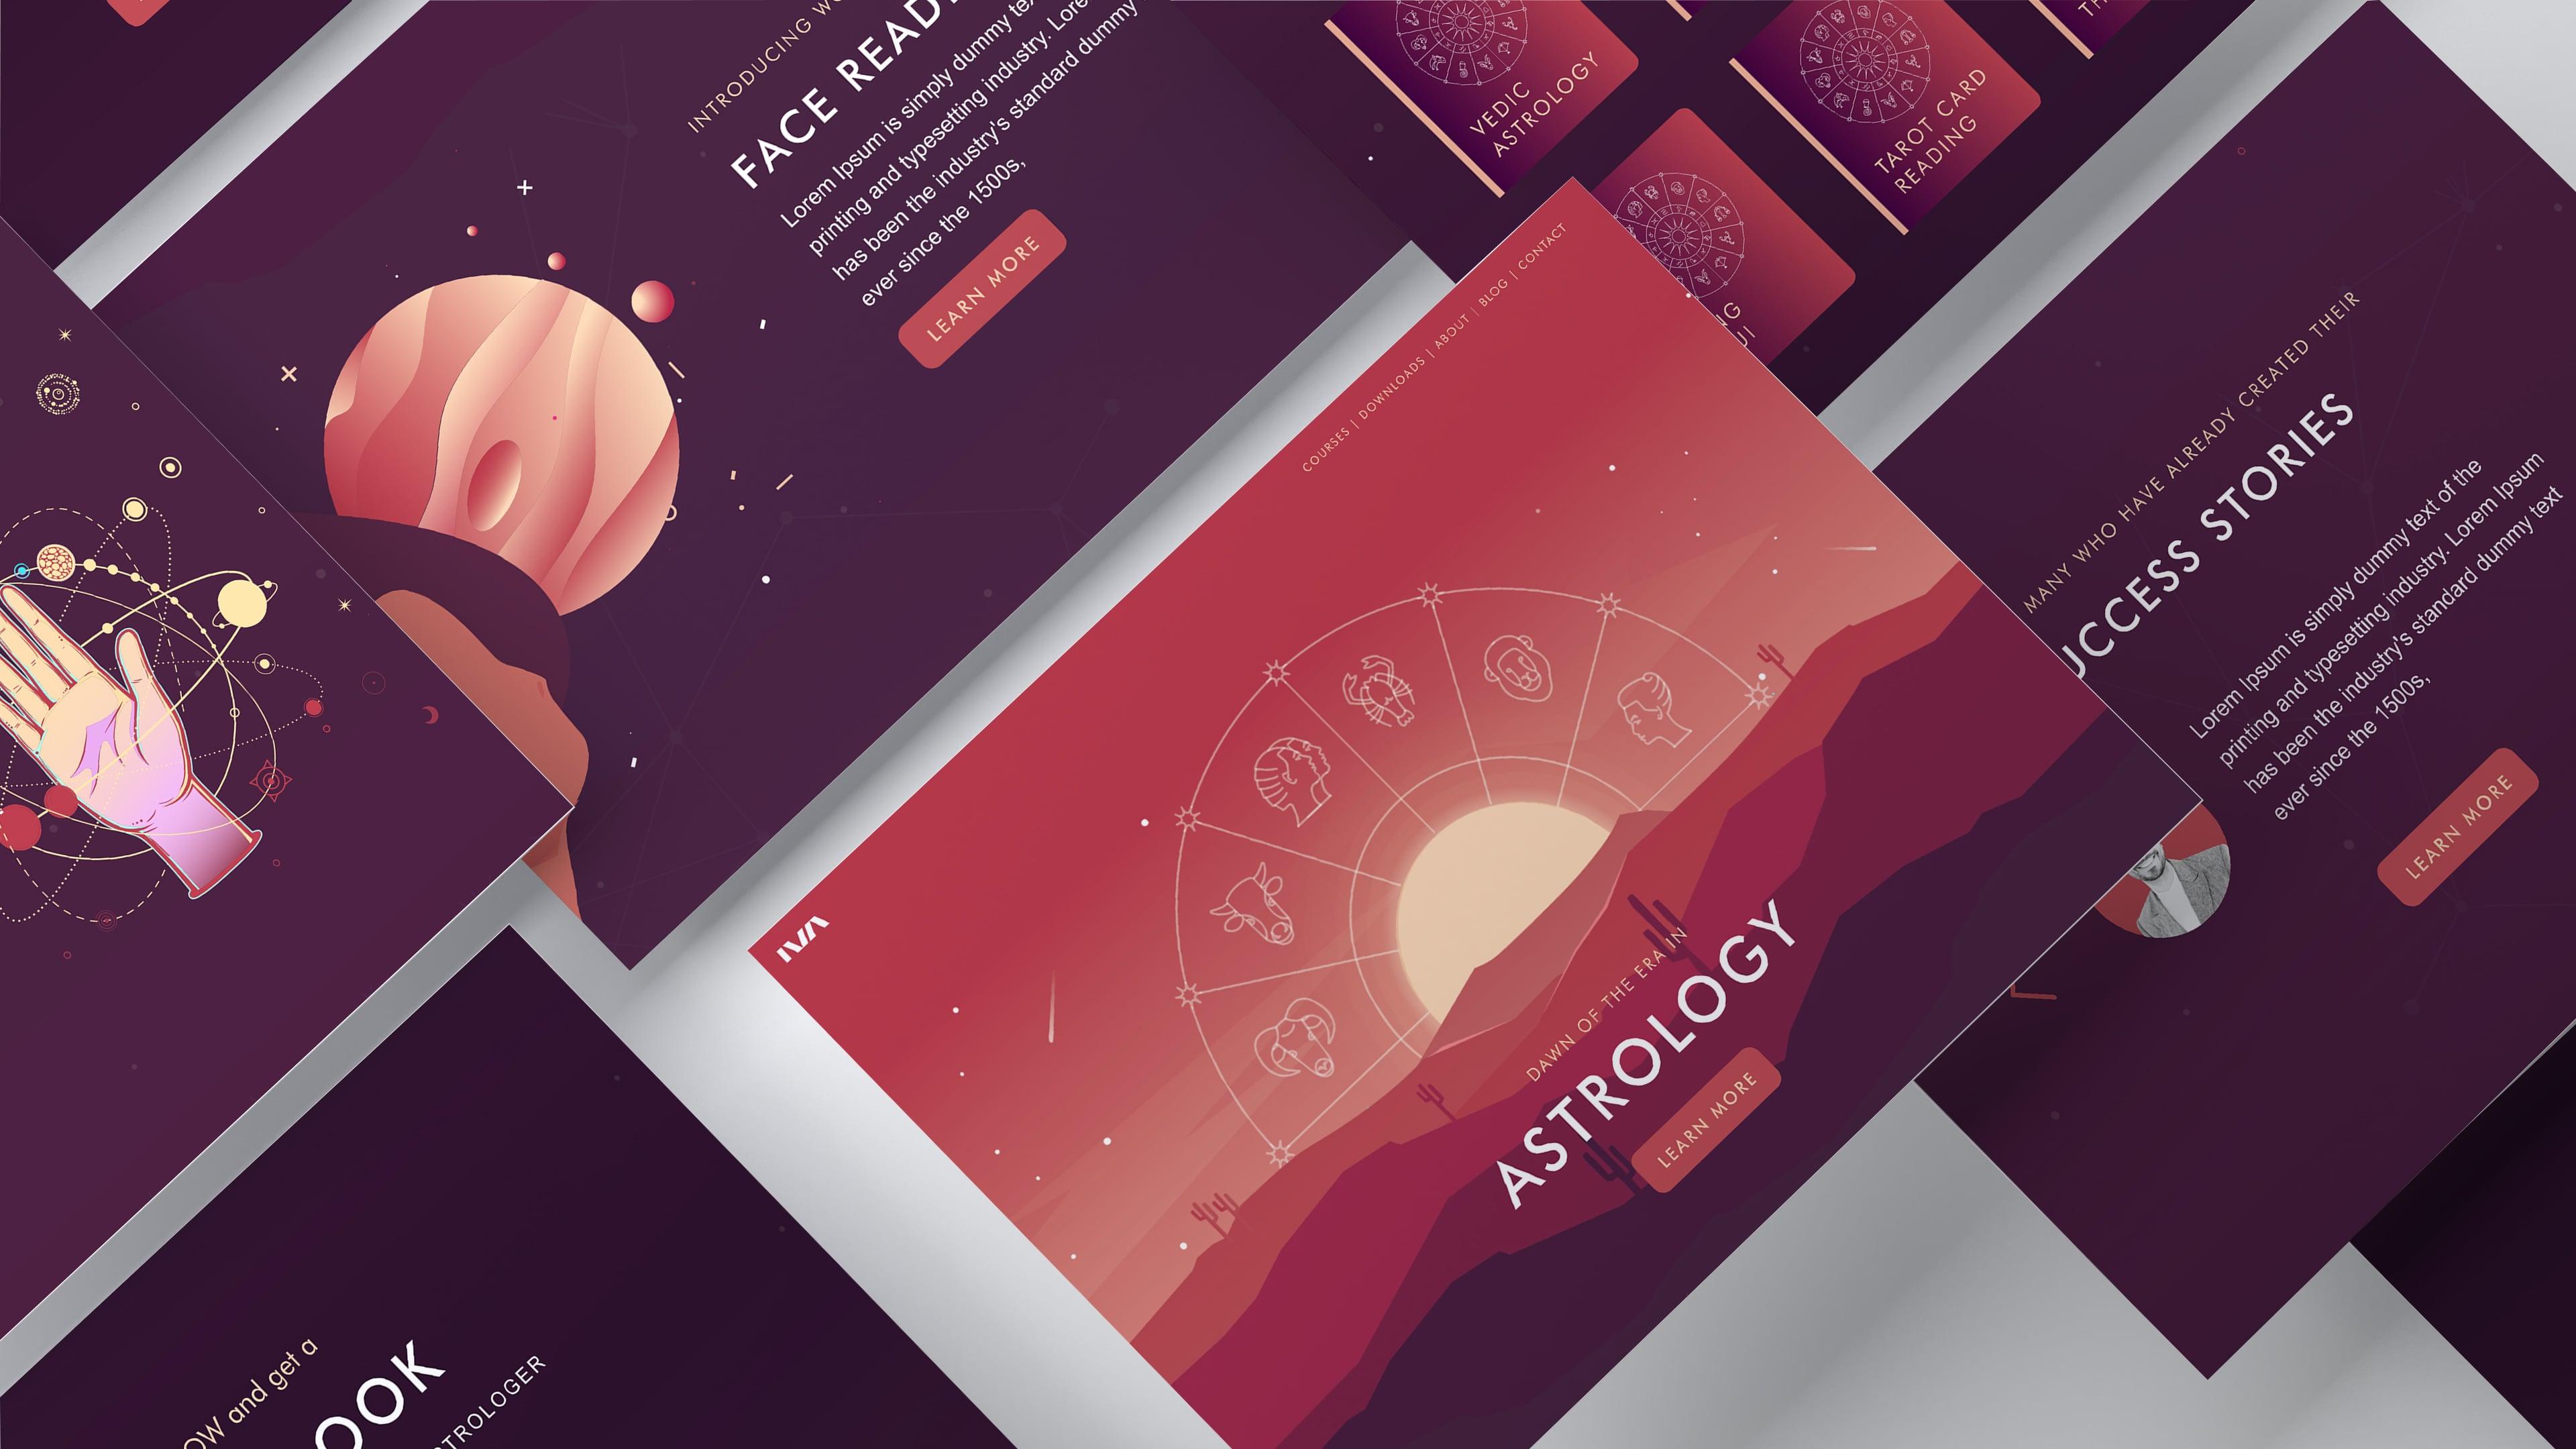 IVA Astrology Mockup